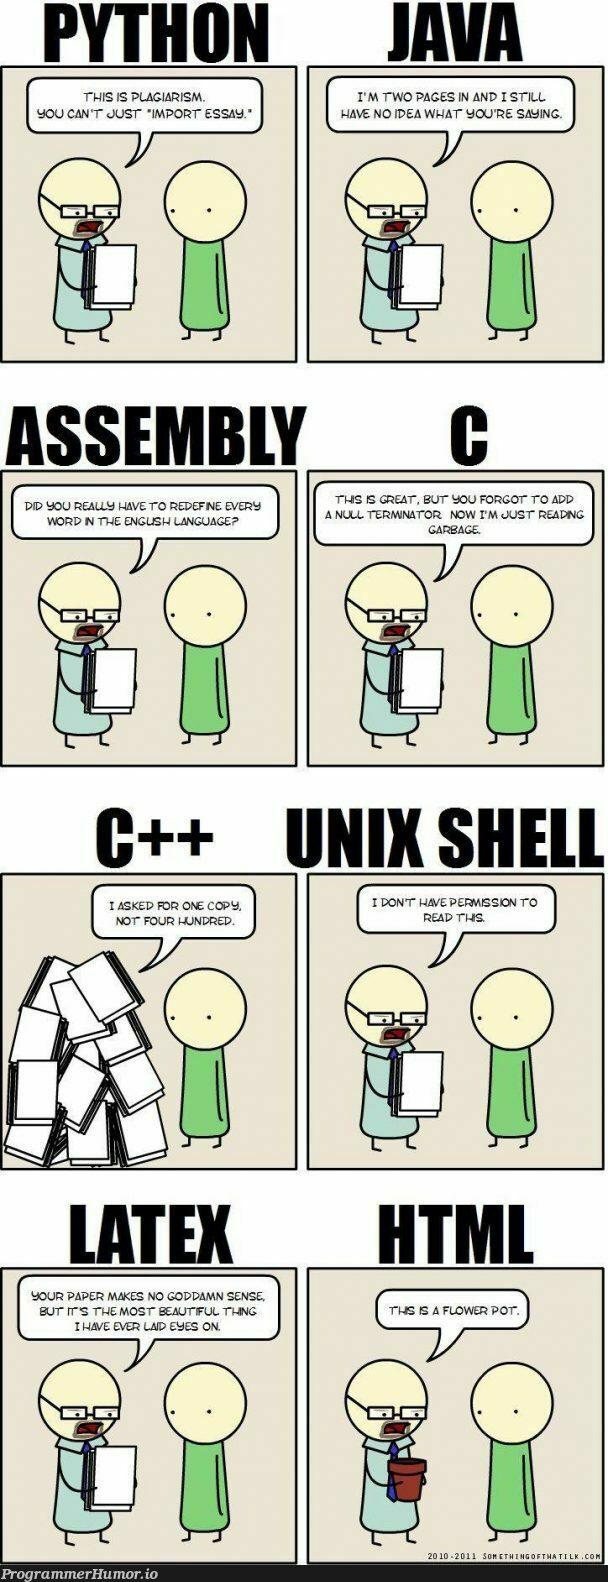 Languages in a nutshell   java-memes, python-memes, shell-memes, idea-memes, ide-memes, language-memes   ProgrammerHumor.io